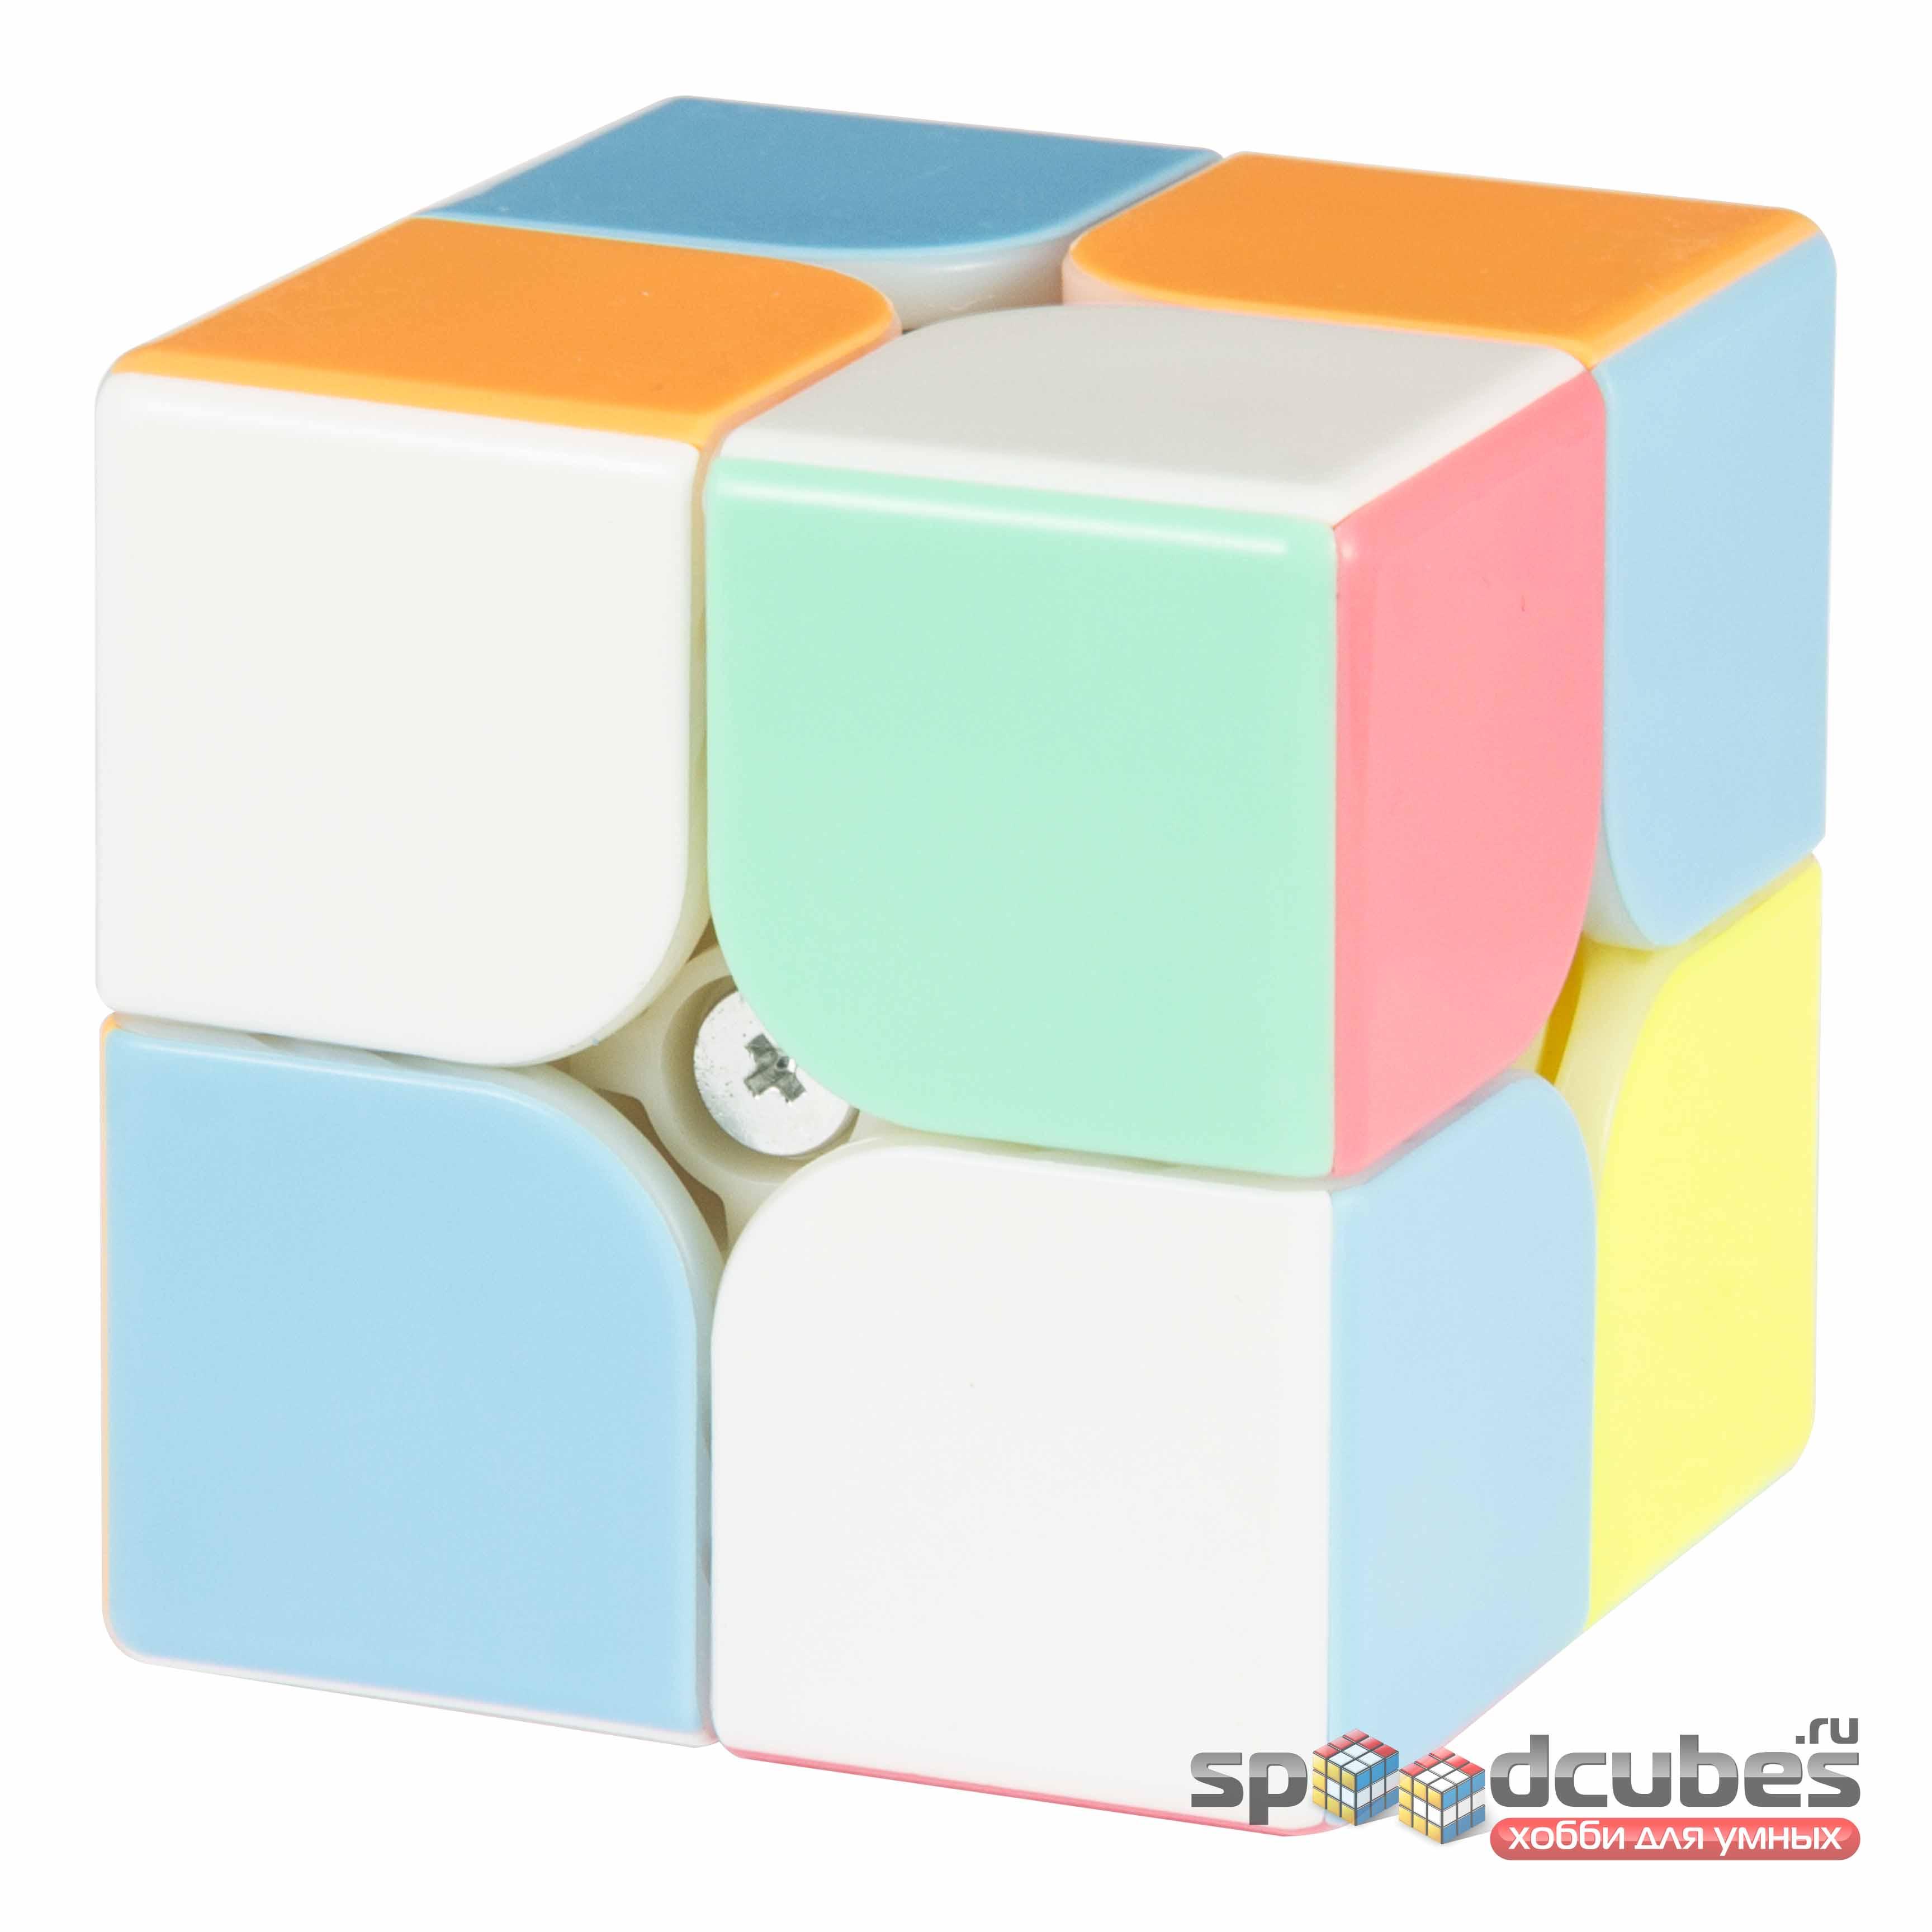 YJ 2x2x2 Yupo Plus M Color 3